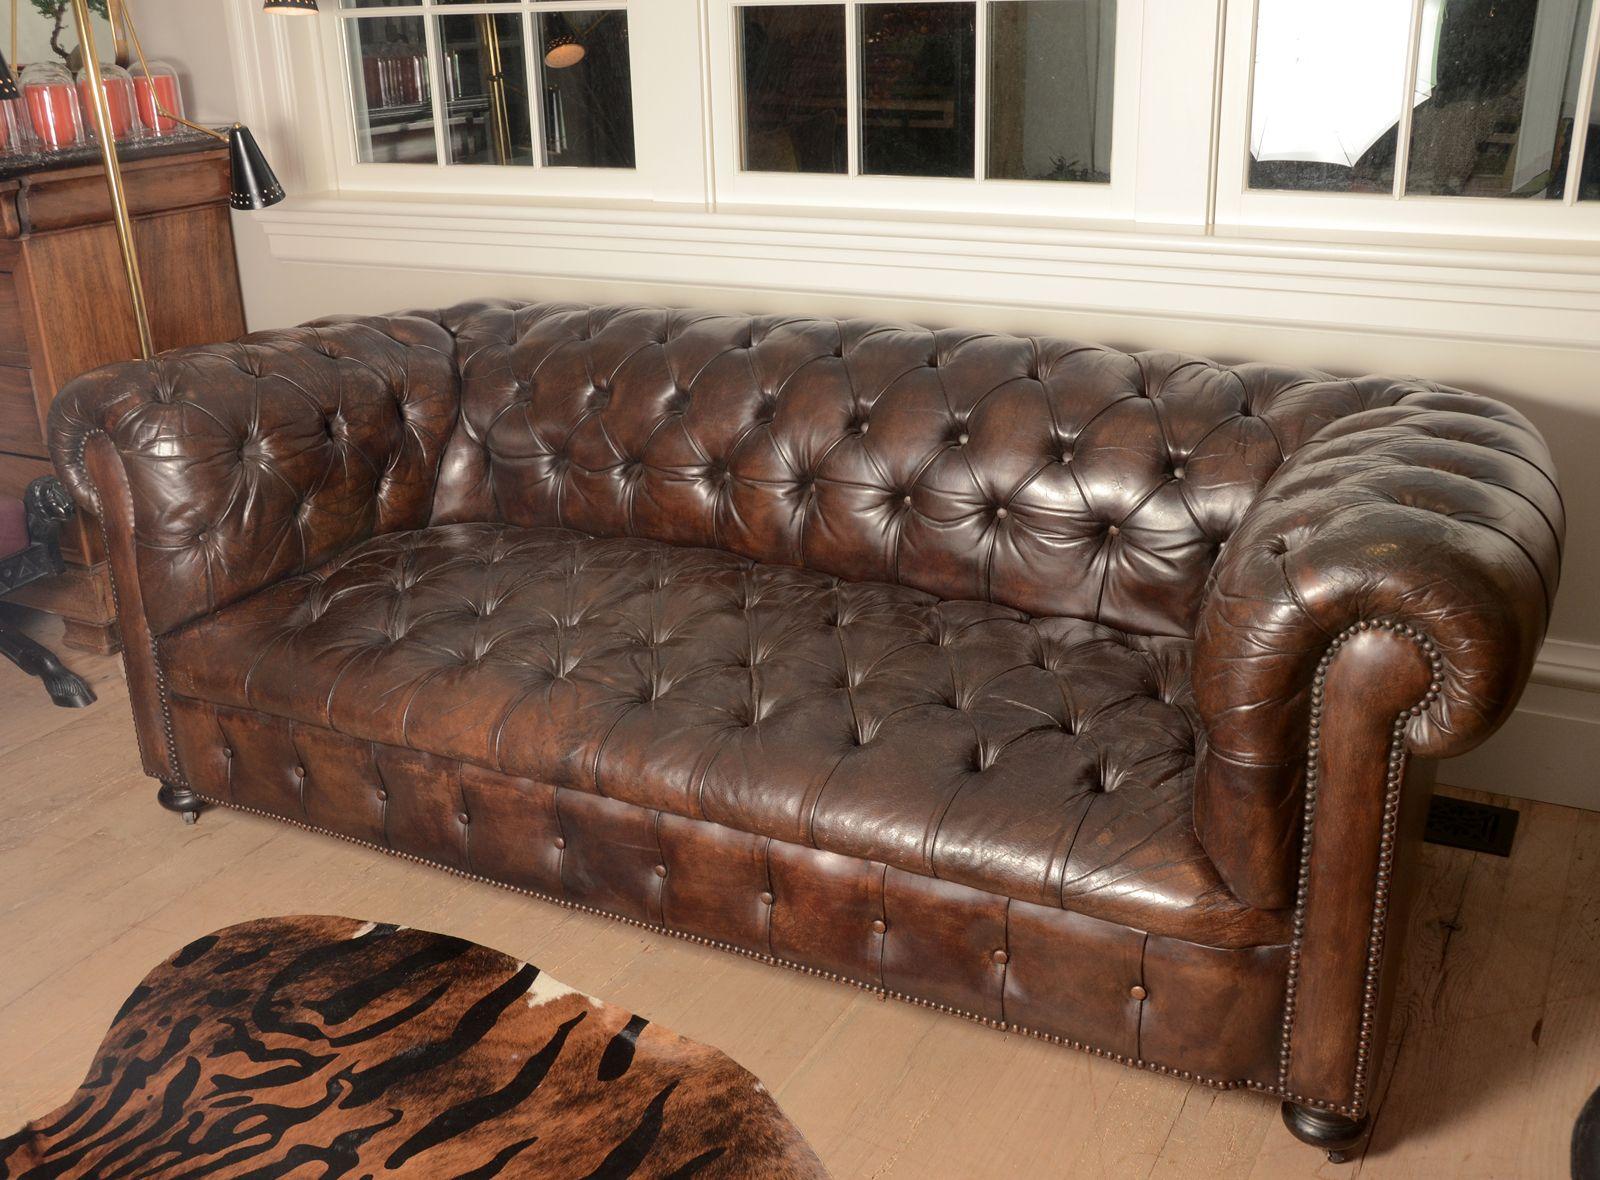 French Midcentury Chesterfield Sofa In Dark Brown In 2020 Mid Century Modern Sofa Mid Century Sofa Chesterfield Sofa